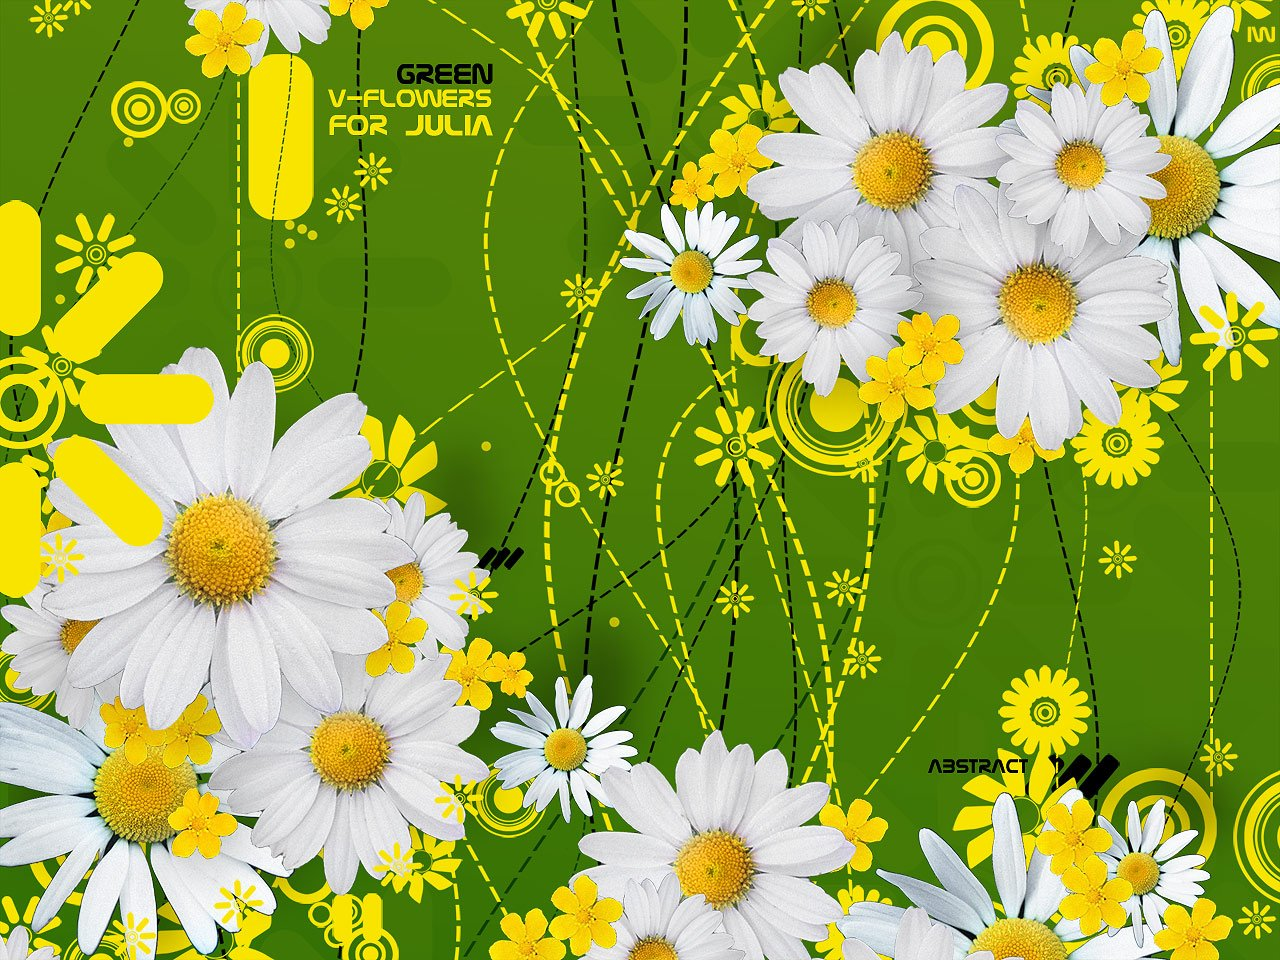 HD Wallpapers: 3D Art Flowers Wallpapers